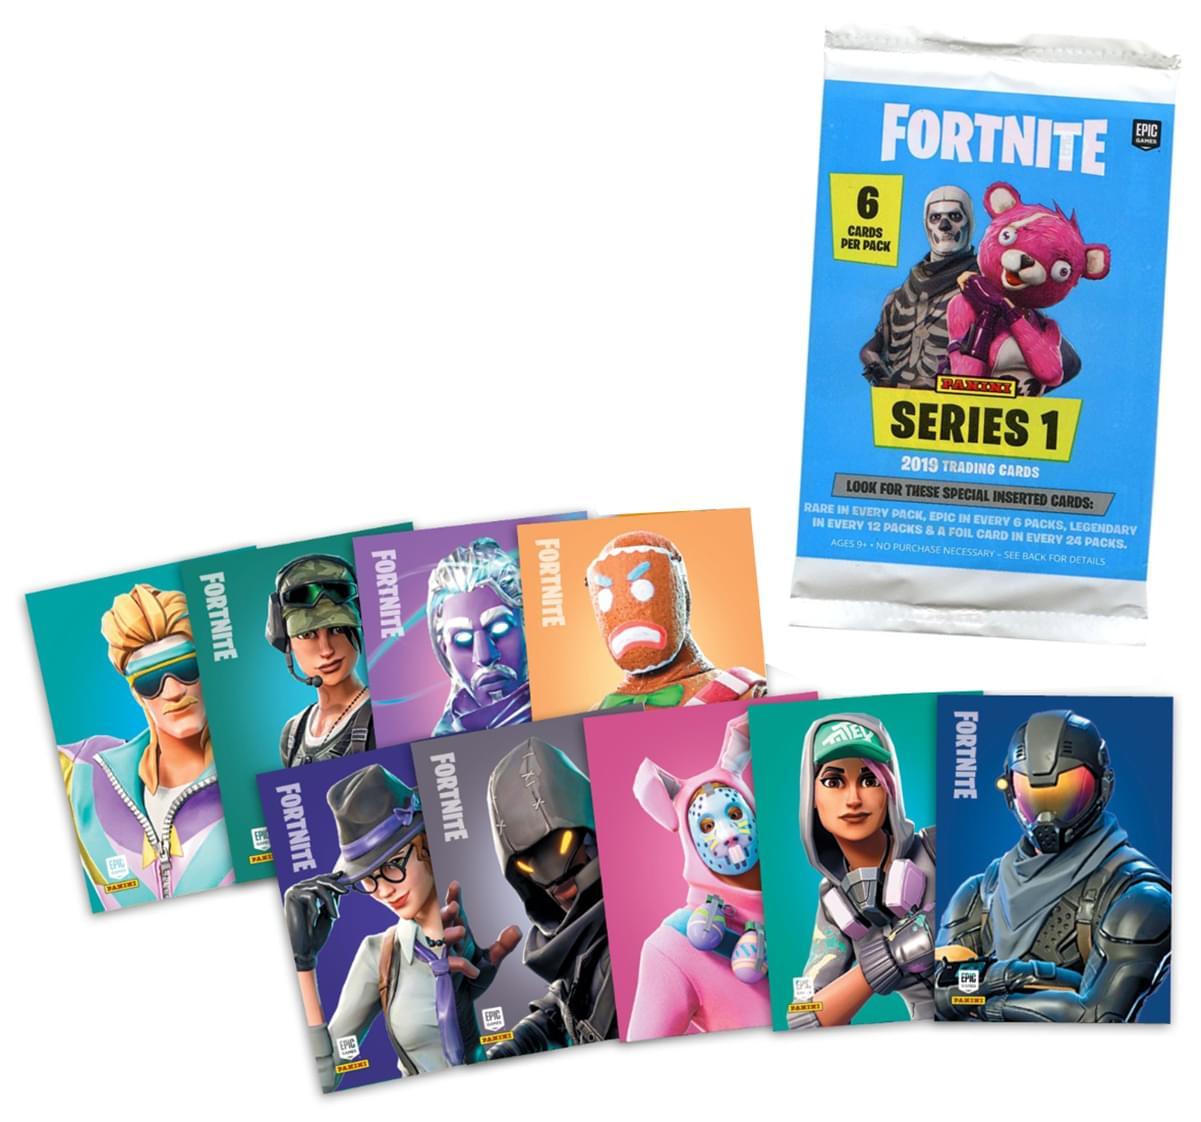 Fortnite Trading Cards Series 1 Foil Pack - 6 Cards